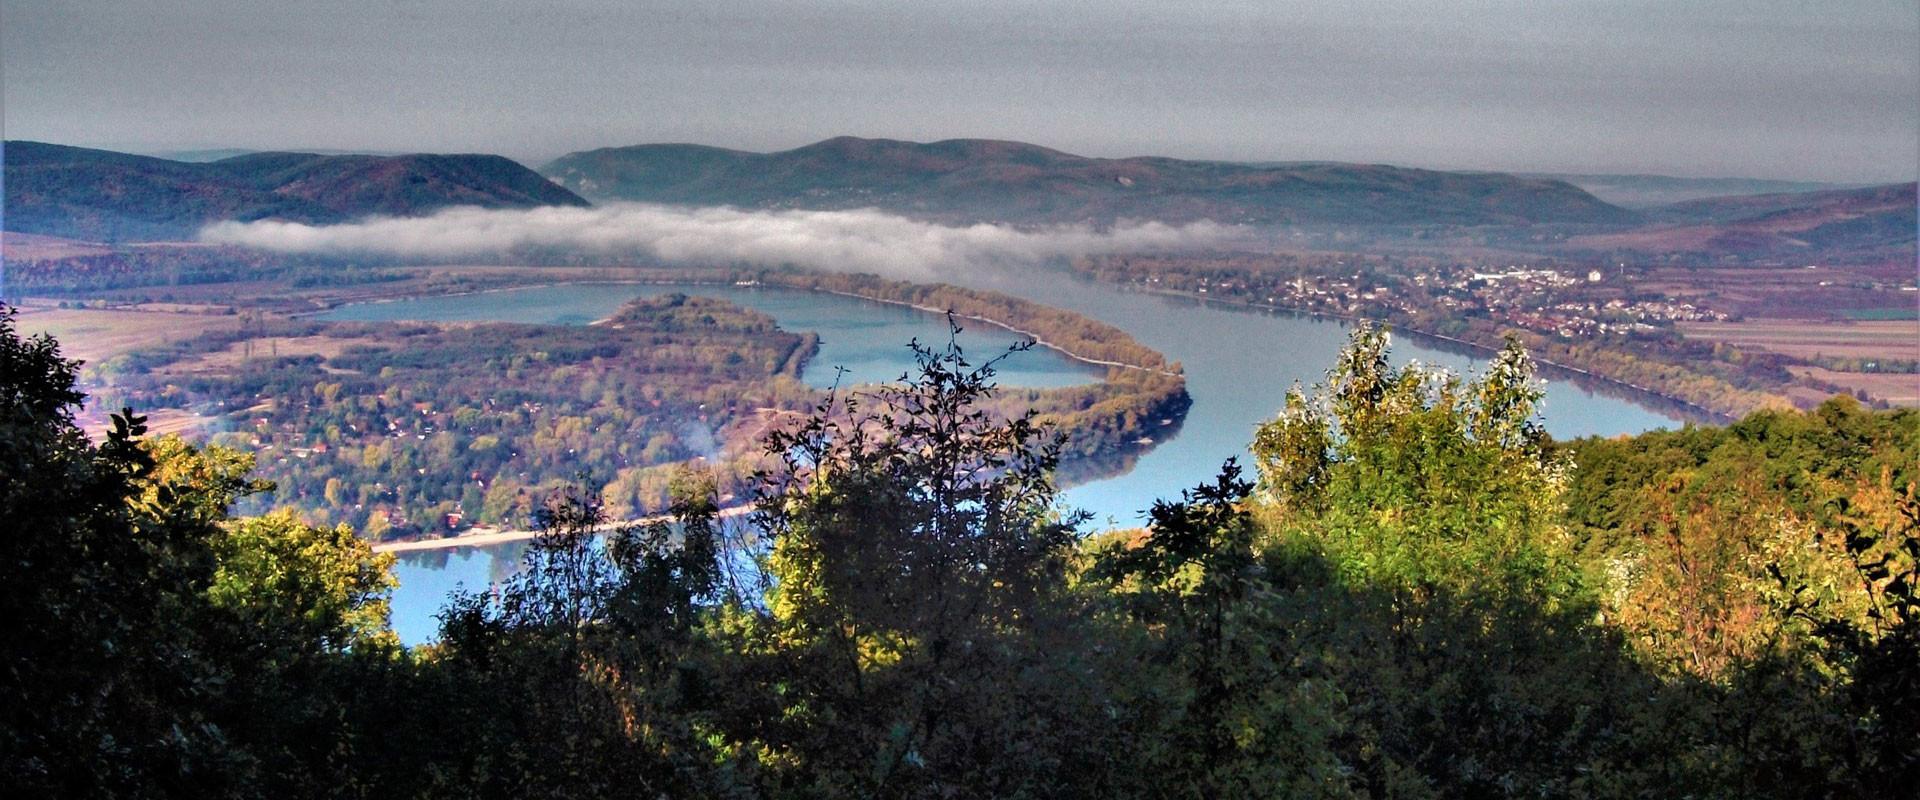 Near Zebegény (Hungary)